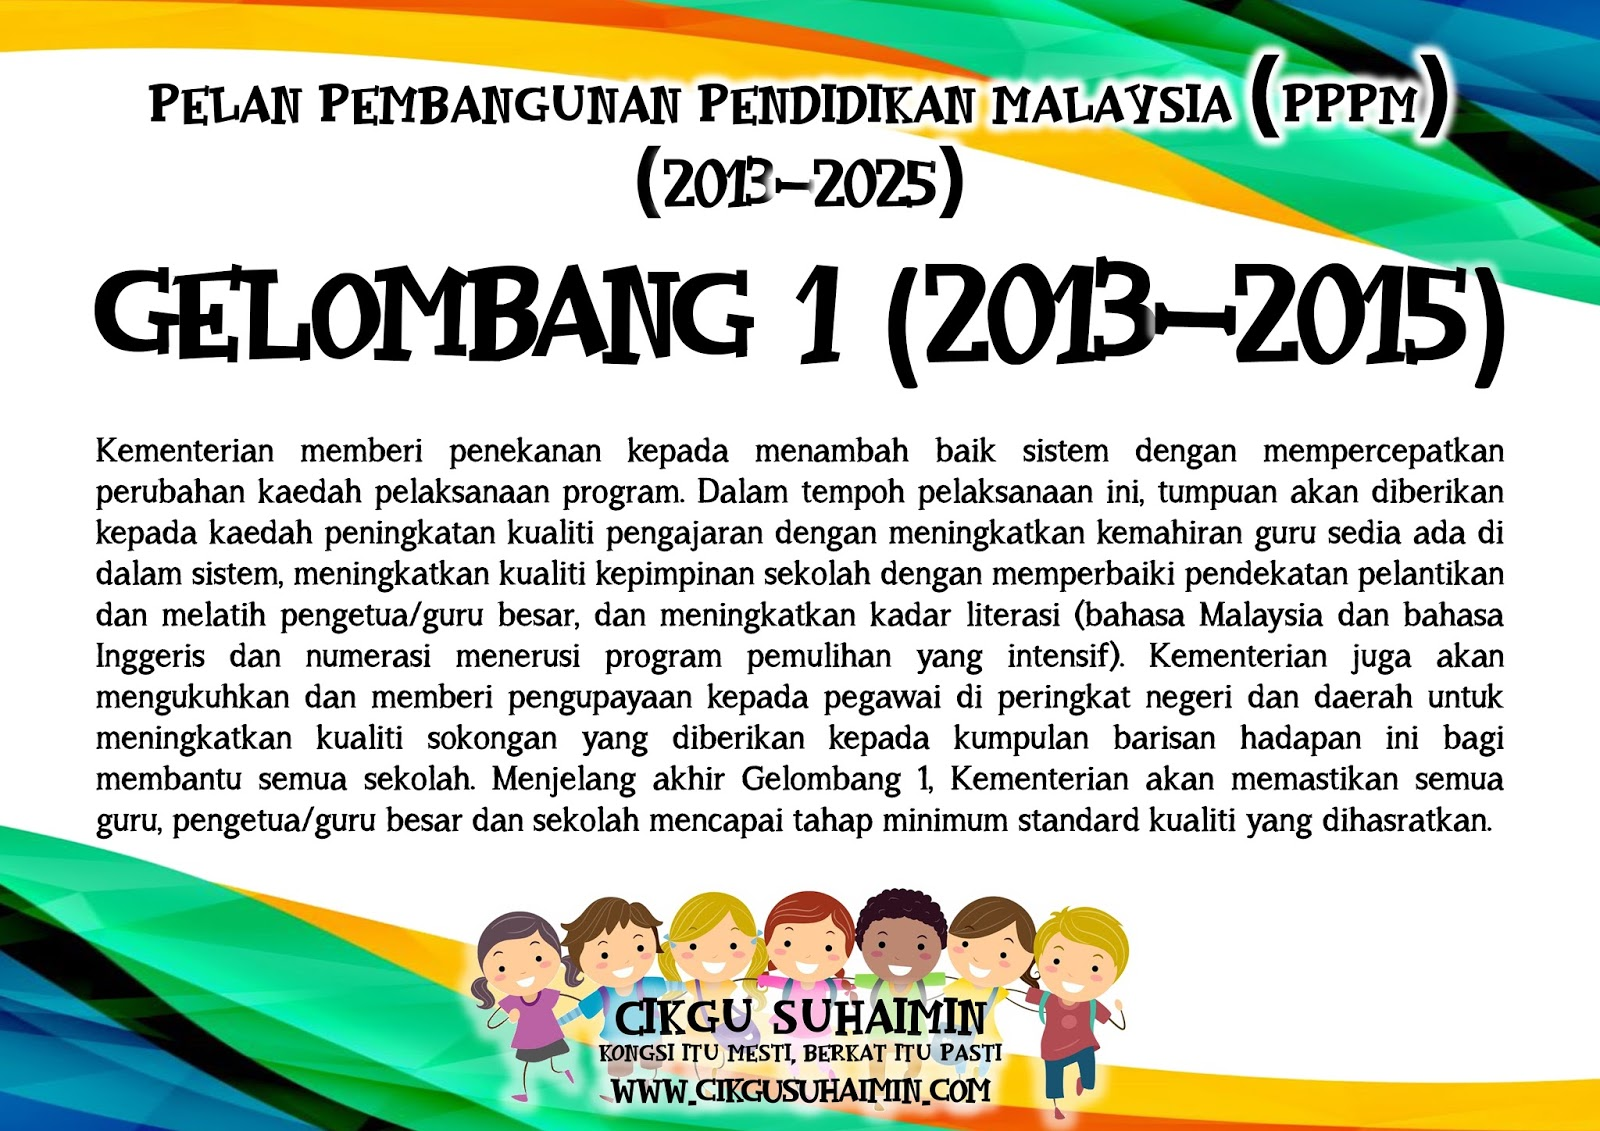 Grafik Info Ringkas Pelan Pembangunan Pendidikan Malaysia Pppm 2013 2025